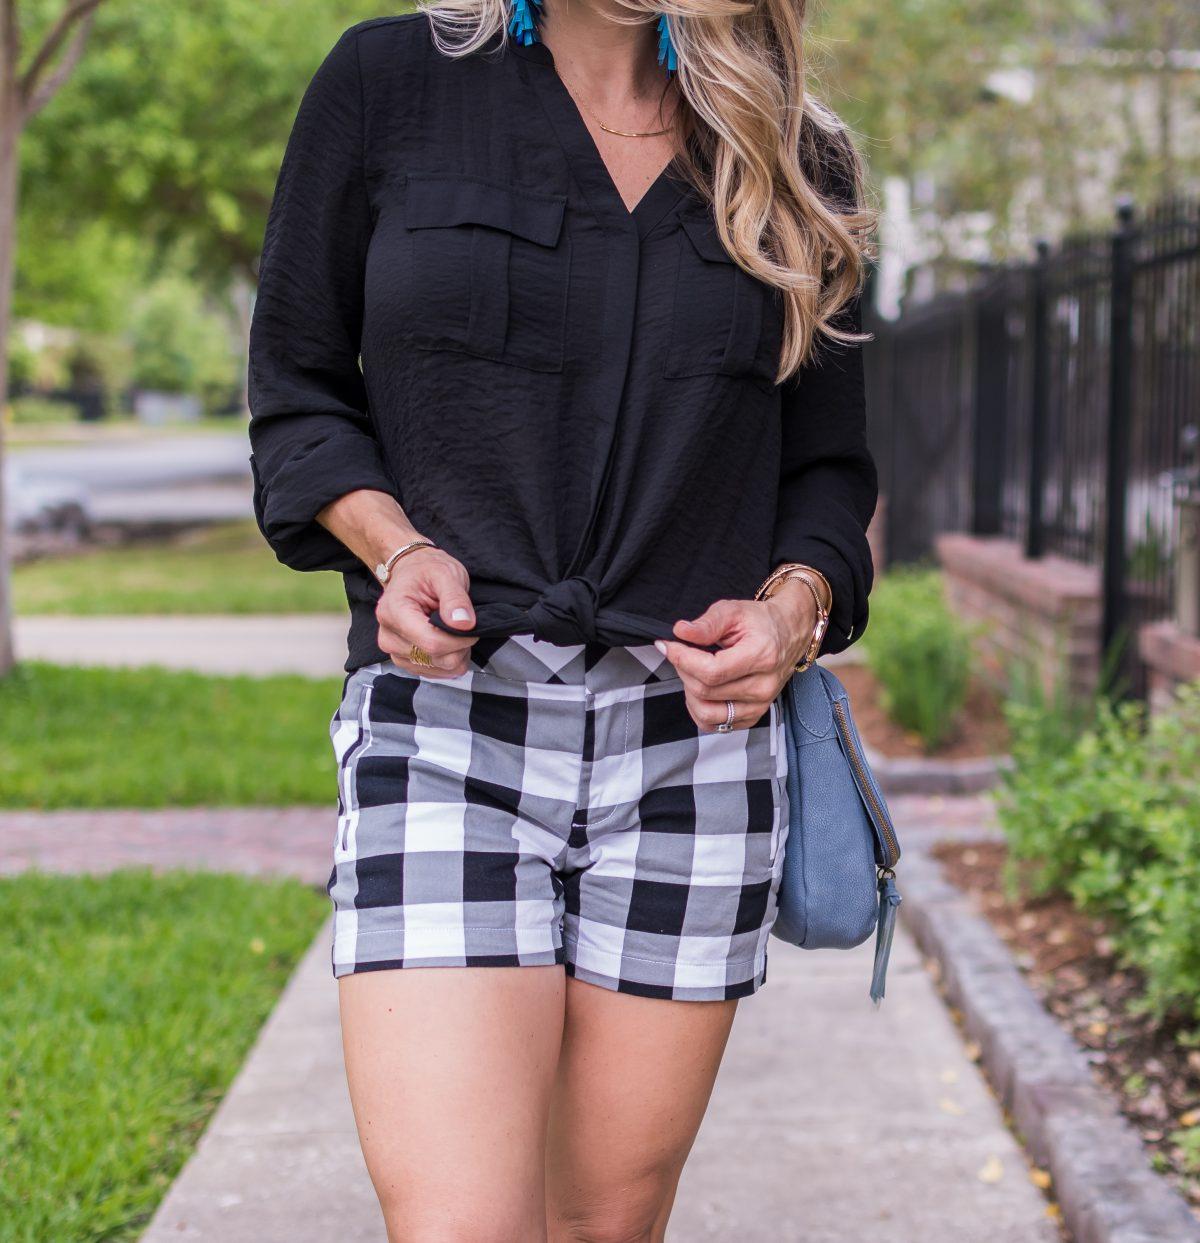 Spring fashion -black and white gingham shorts 9